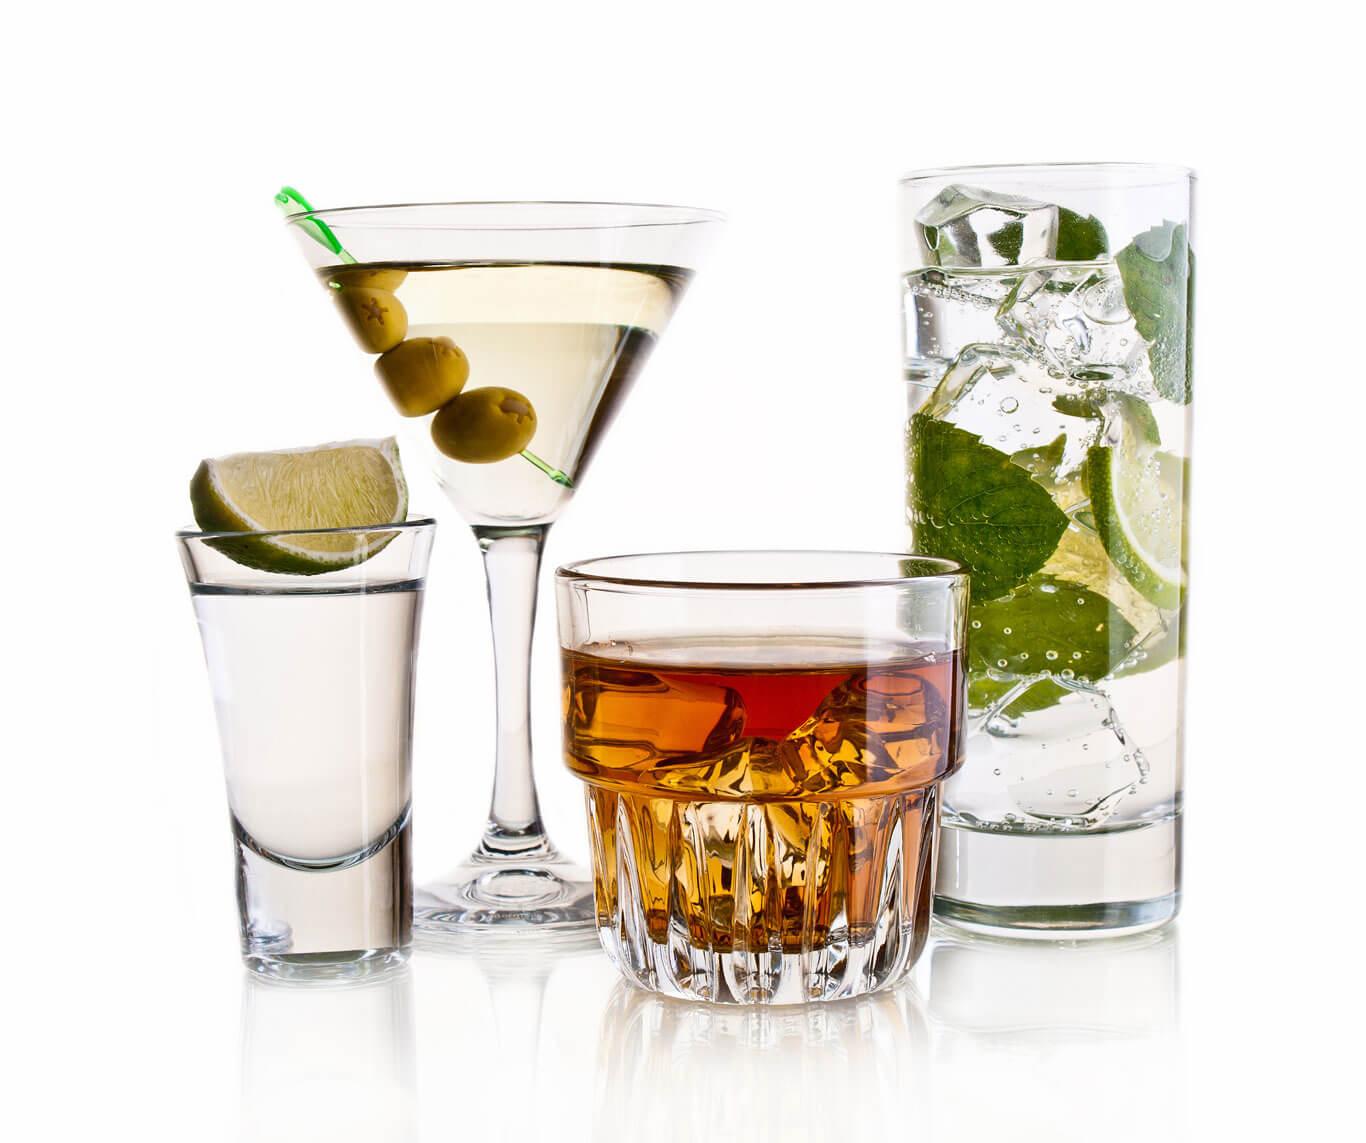 Windsor Liquor Stores Brand's Beverage